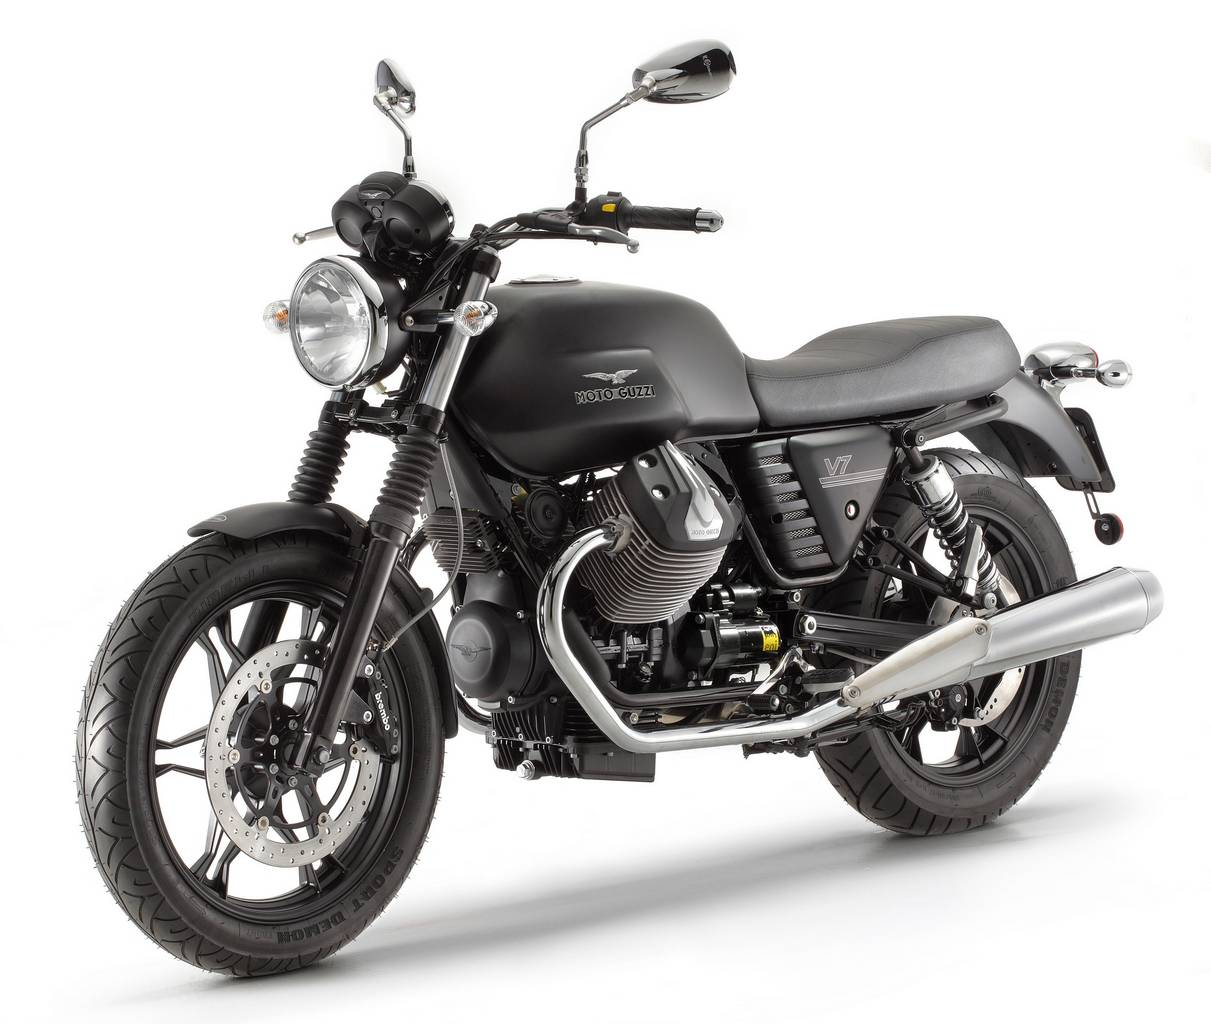 cafe racer special 2012 moto guzzi v7 classic. Black Bedroom Furniture Sets. Home Design Ideas